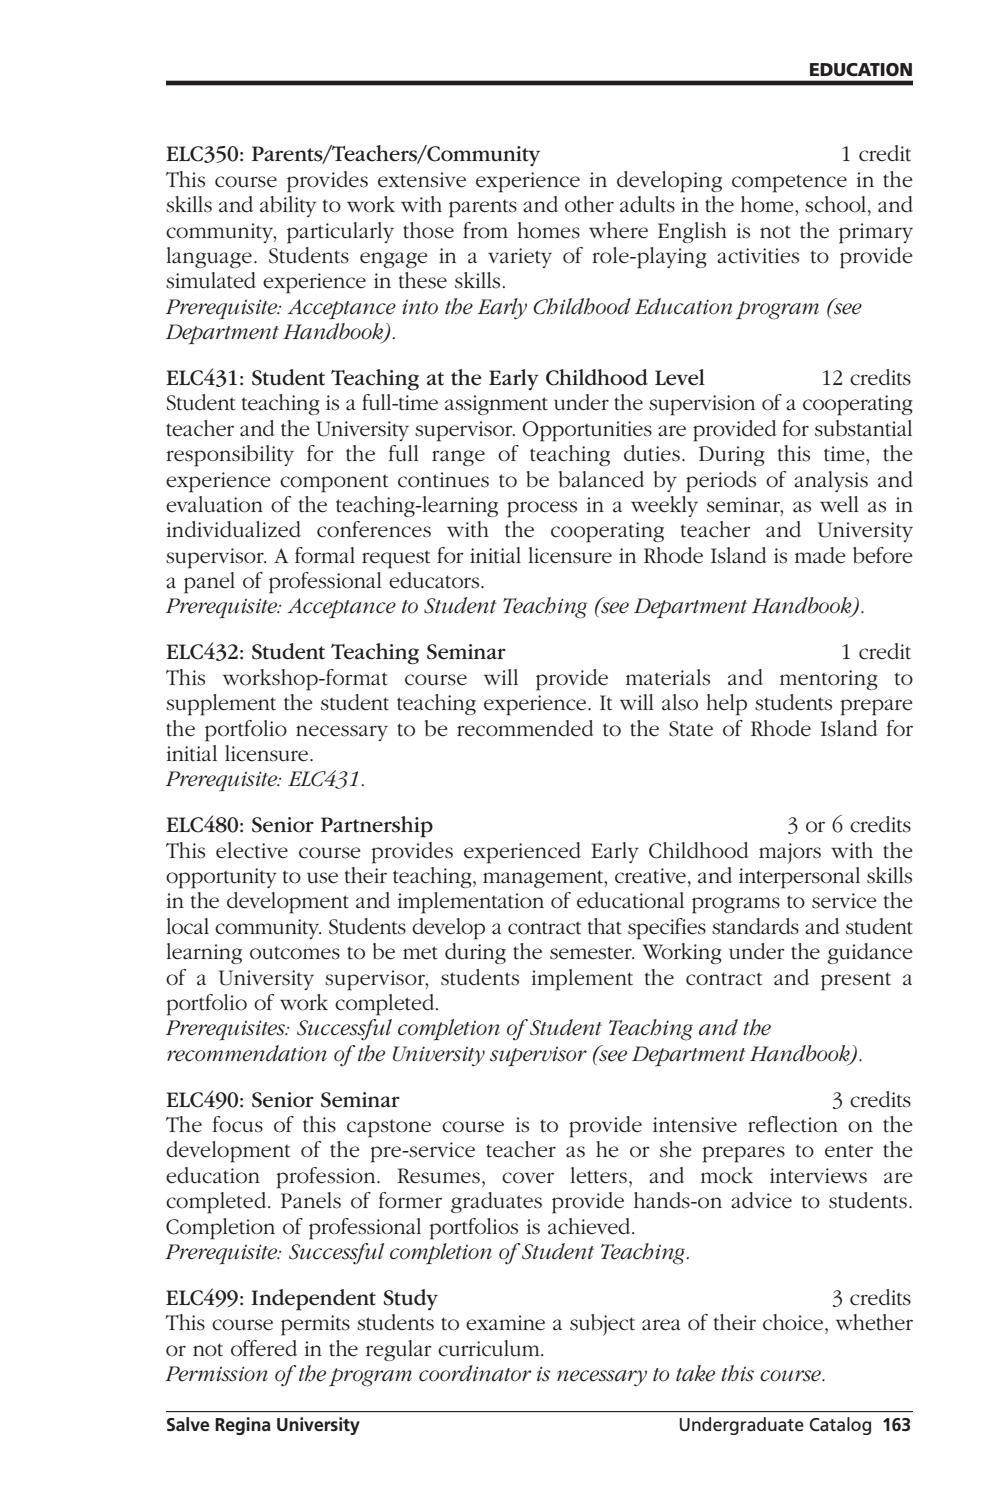 Salve Regina University Undergraduate Catalog 2013-2014 by ...